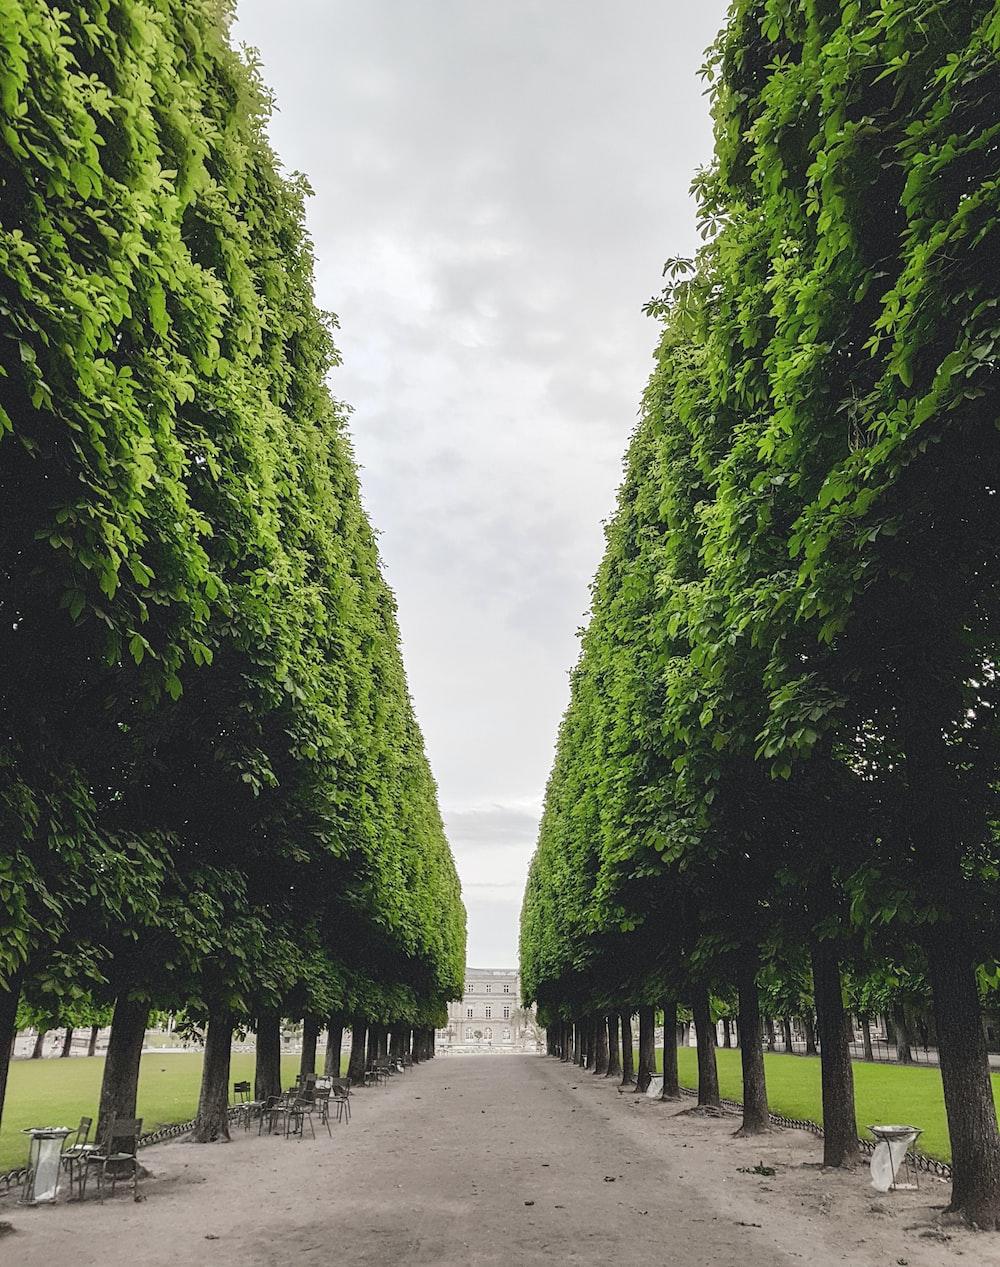 park between trees